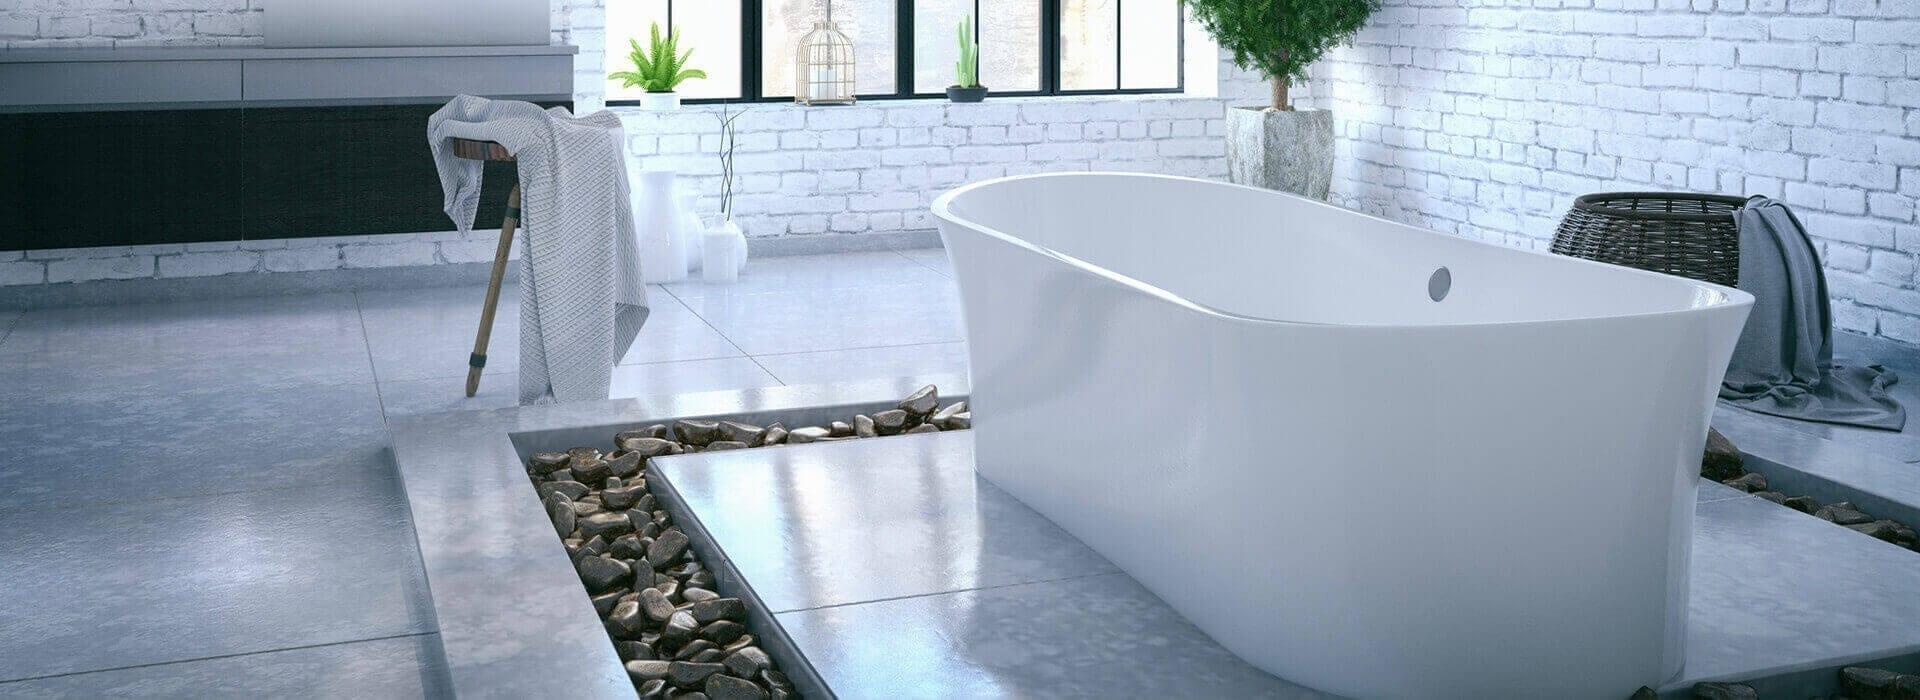 Bathtub Refinishing Services